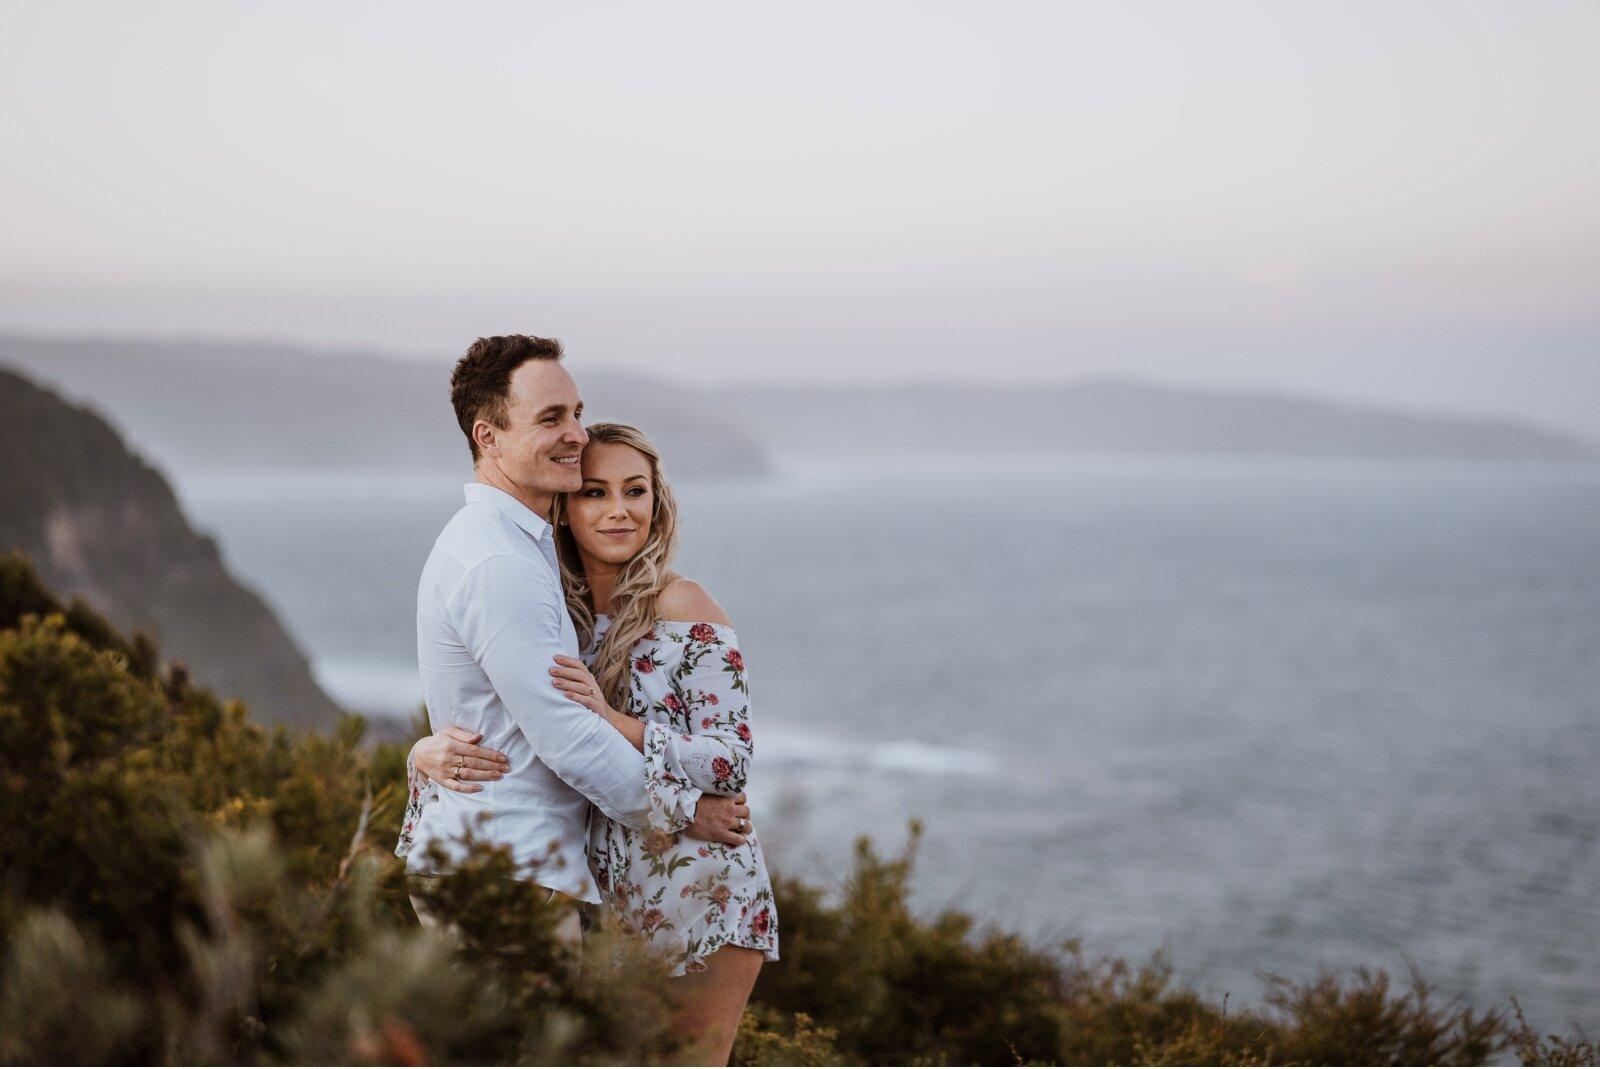 newcastle-wedding-photographer-dudley-engagement-shoot-25.jpg